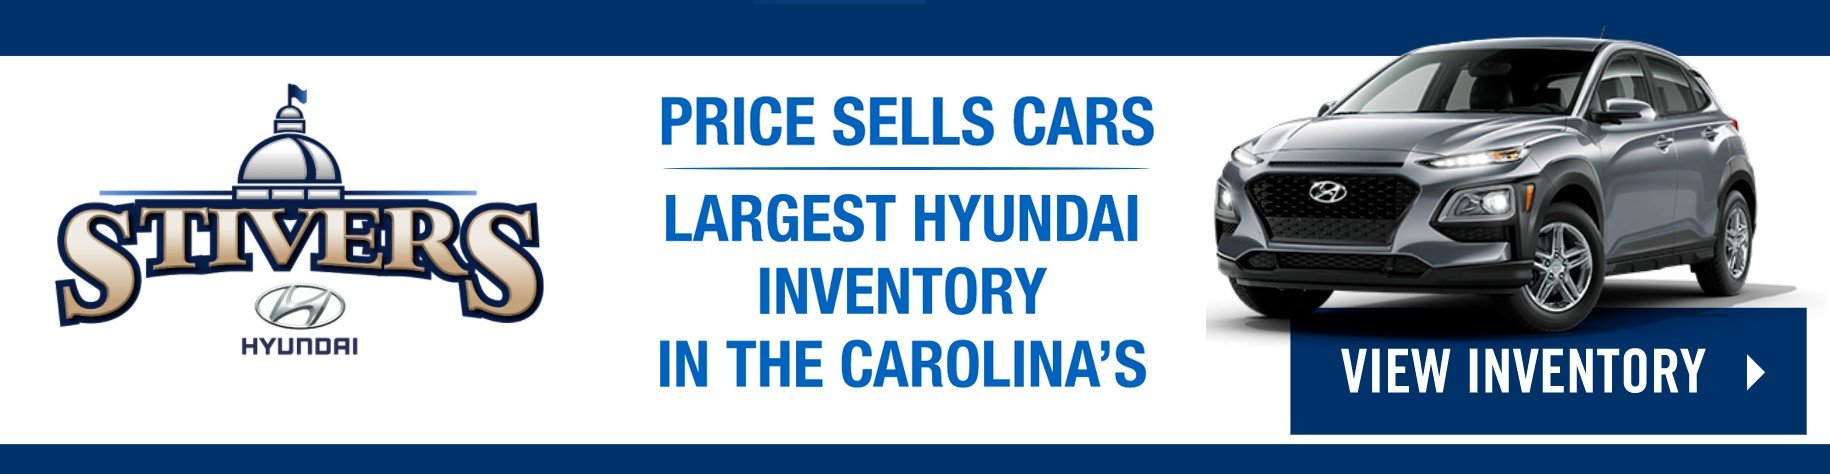 price sells cars